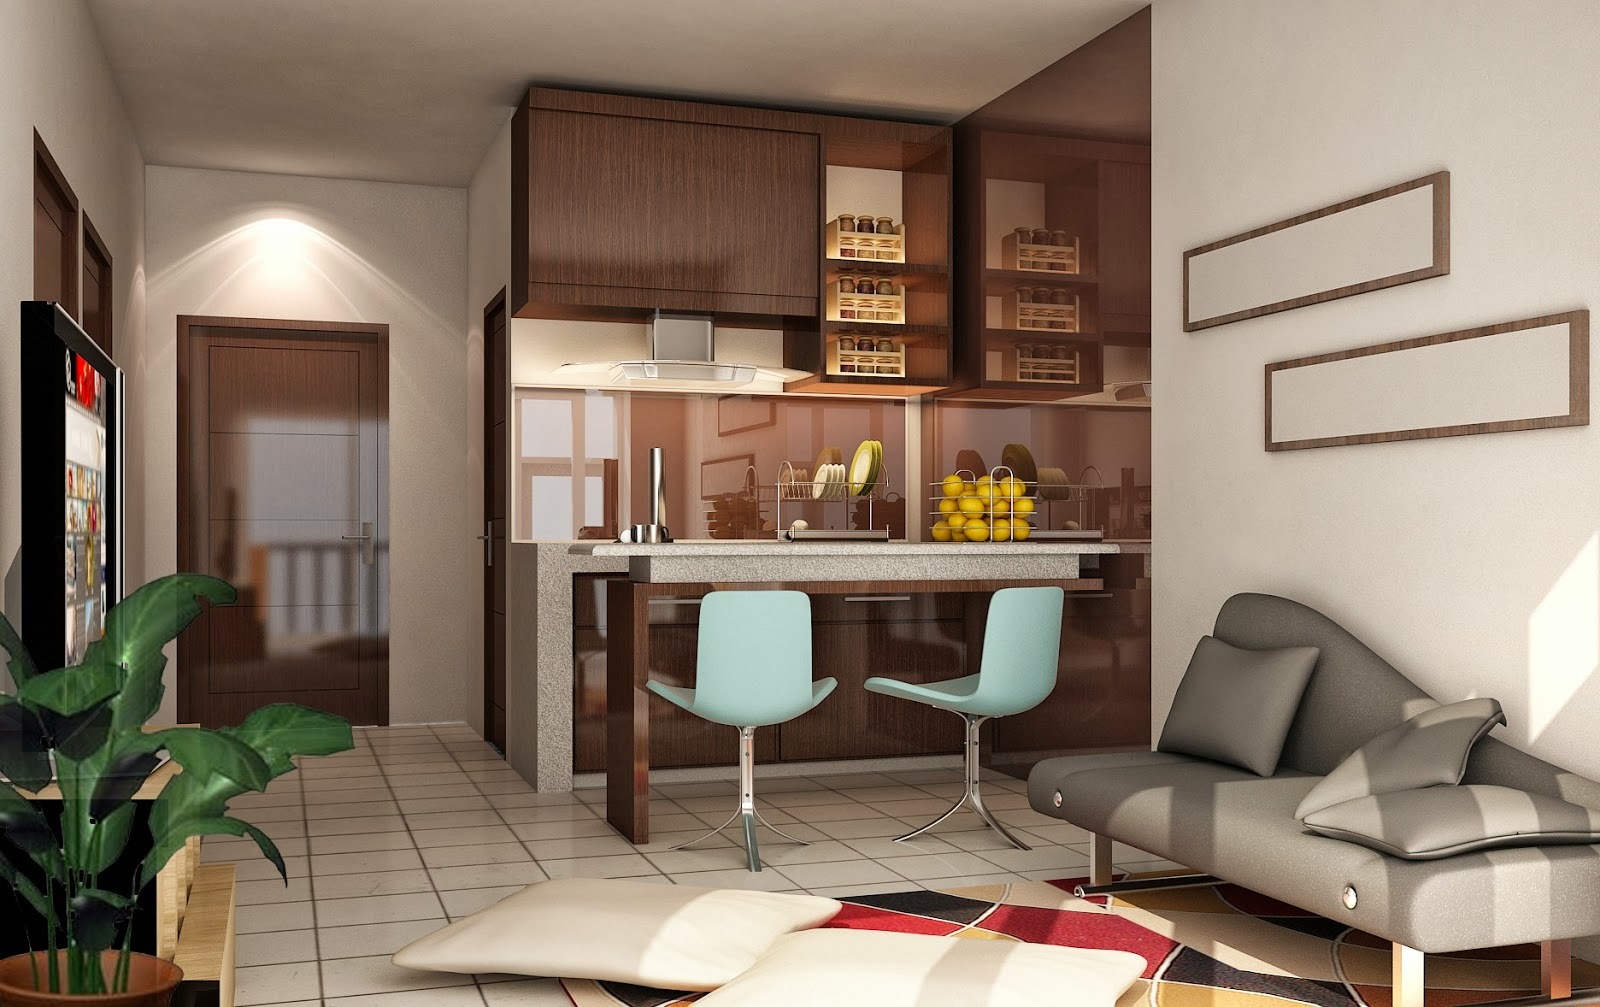 Home Design Type 70 Part - 16: Home Interior Design Minimalist Type 70